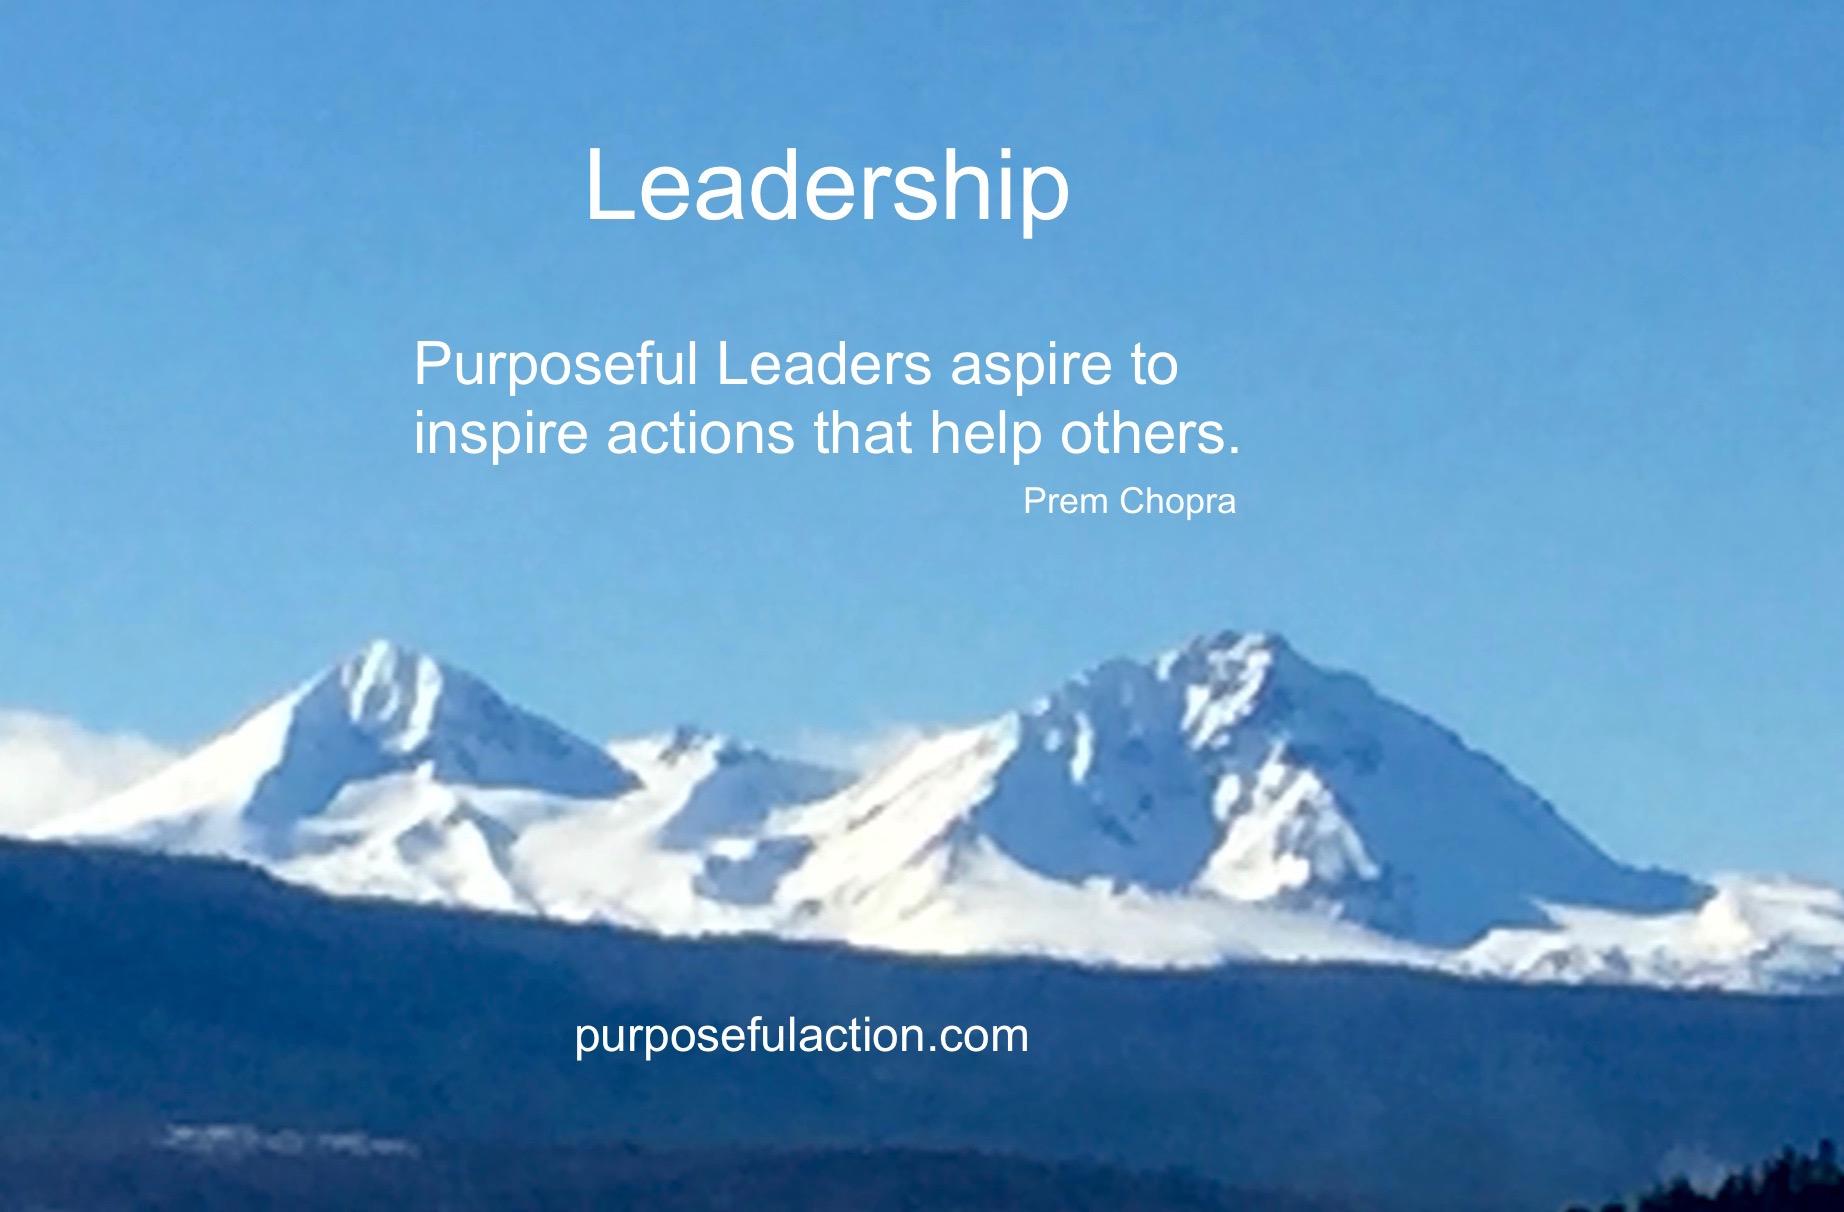 Leadership Inspiration